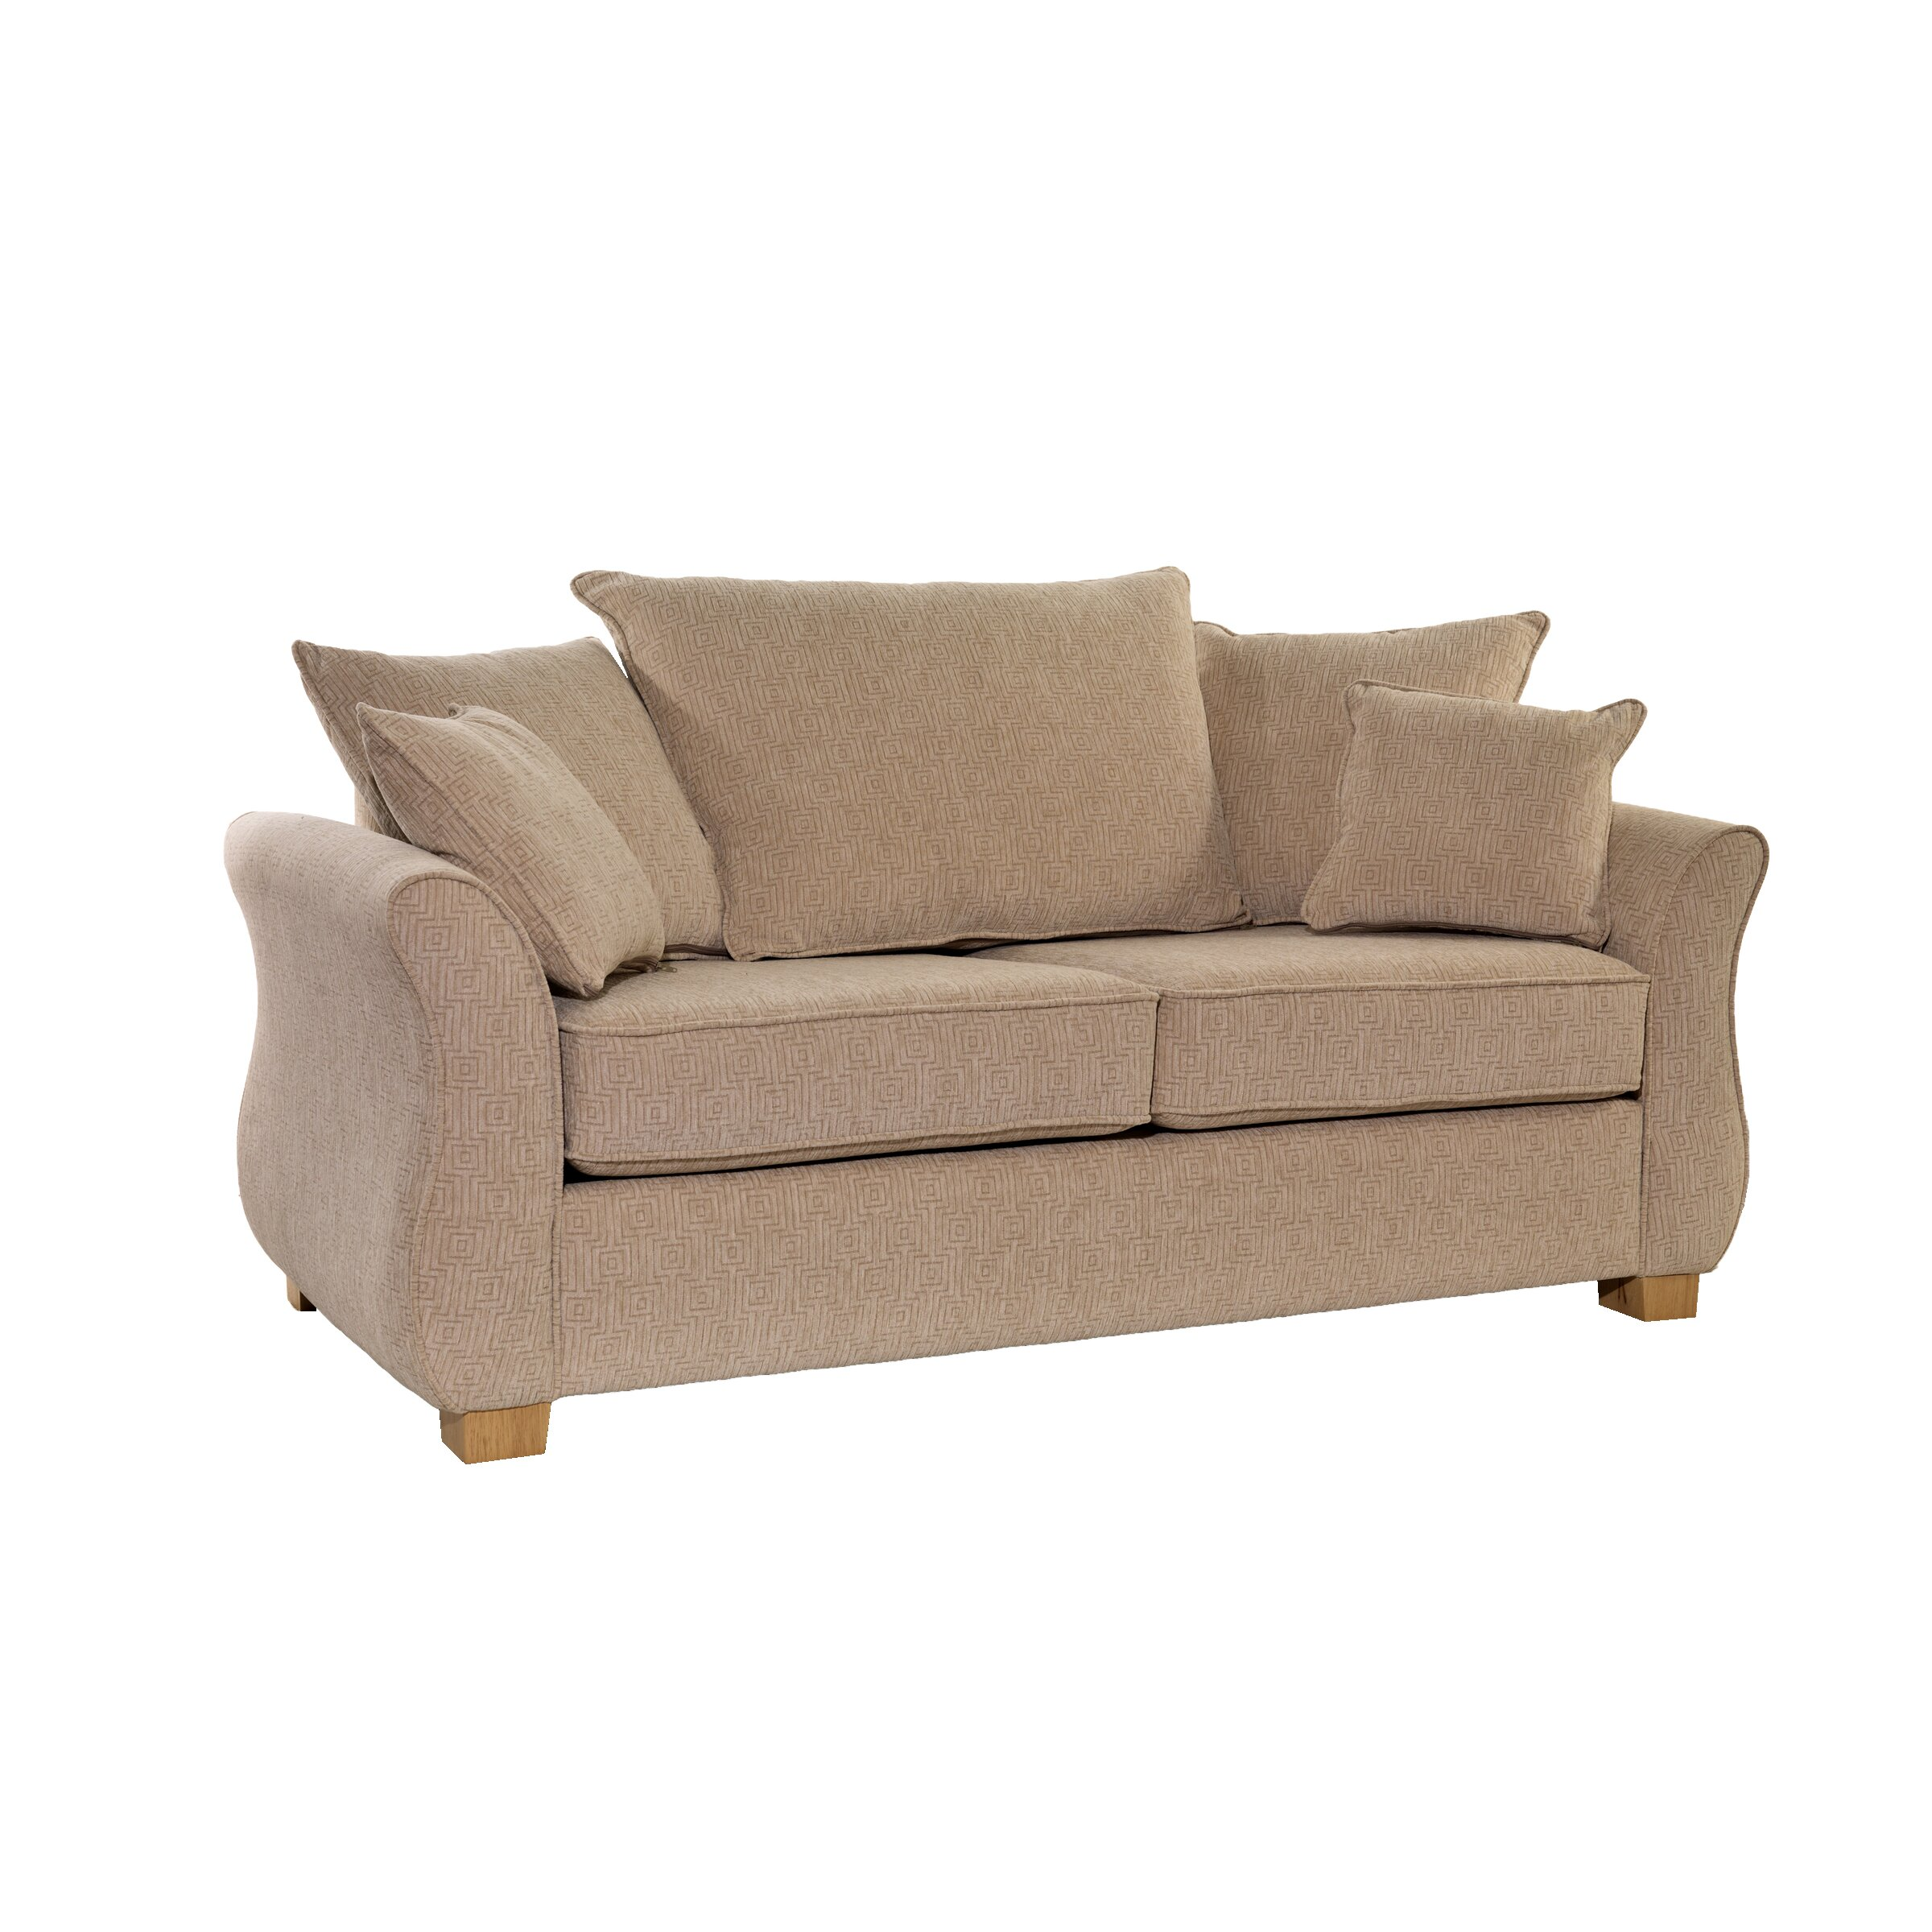 Uk Icon Design Regal 2 Seater Fold Out Sofa Wayfair Uk